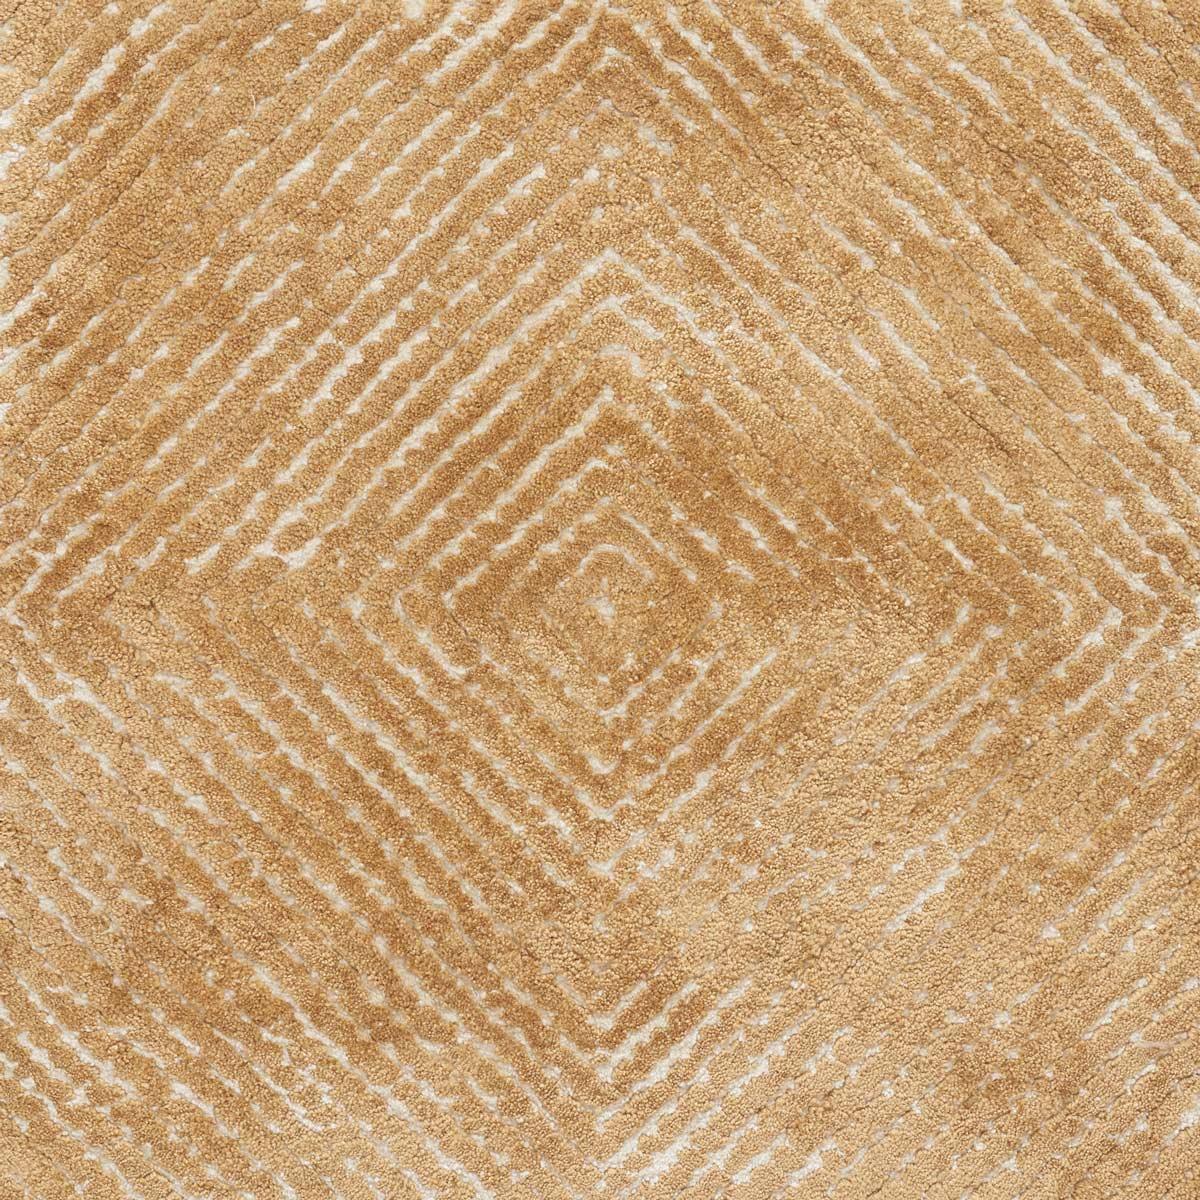 birdseye_faux-silk_hand-woven_patterson-flynn-martin_pfm